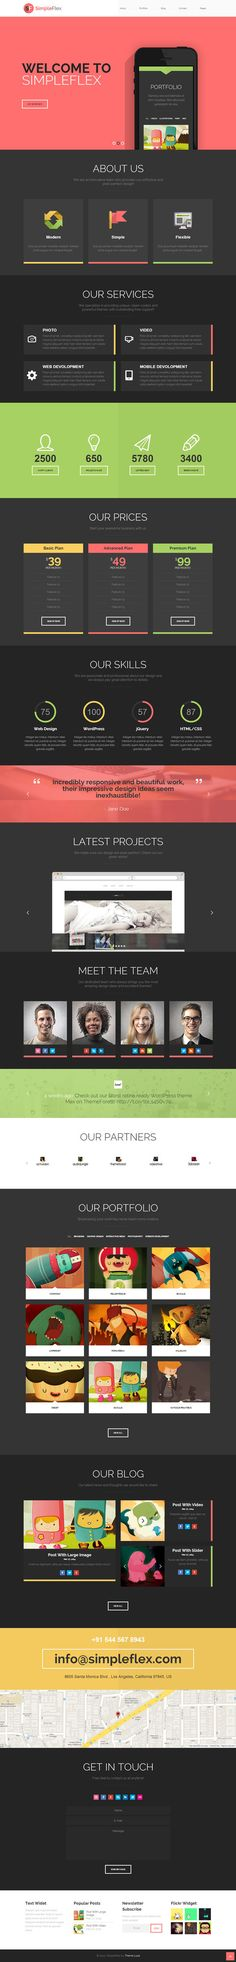 Flat One Page WordPress Theme in Web Design